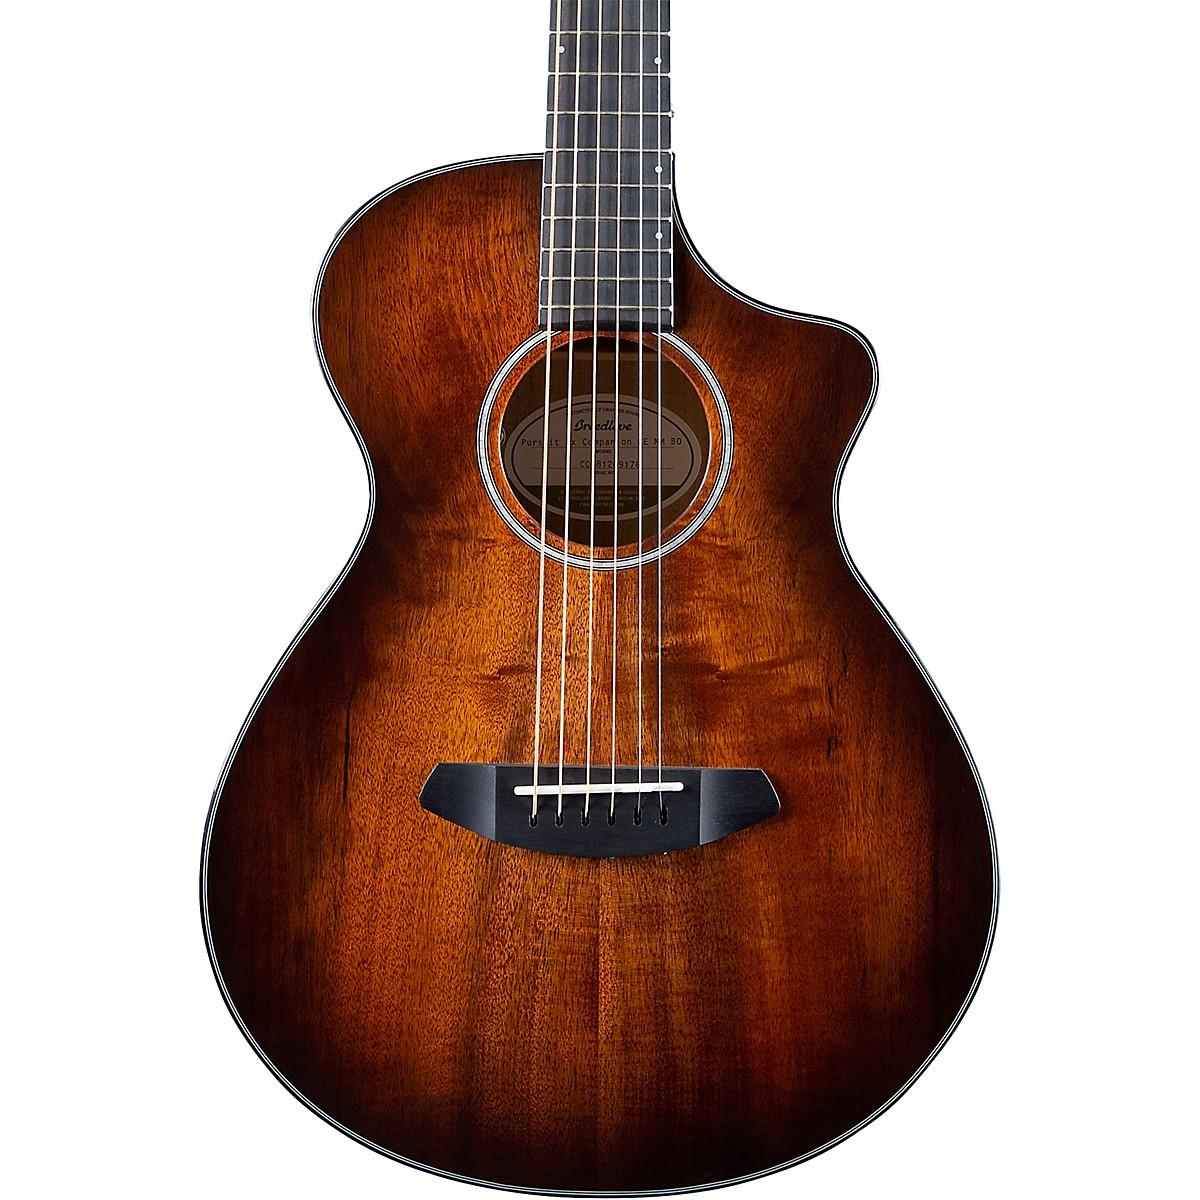 Breedlove Pursuit Exotic Companion CE Myrtlewood-Myrtlewood Travel Acoustic-Electric Guitar